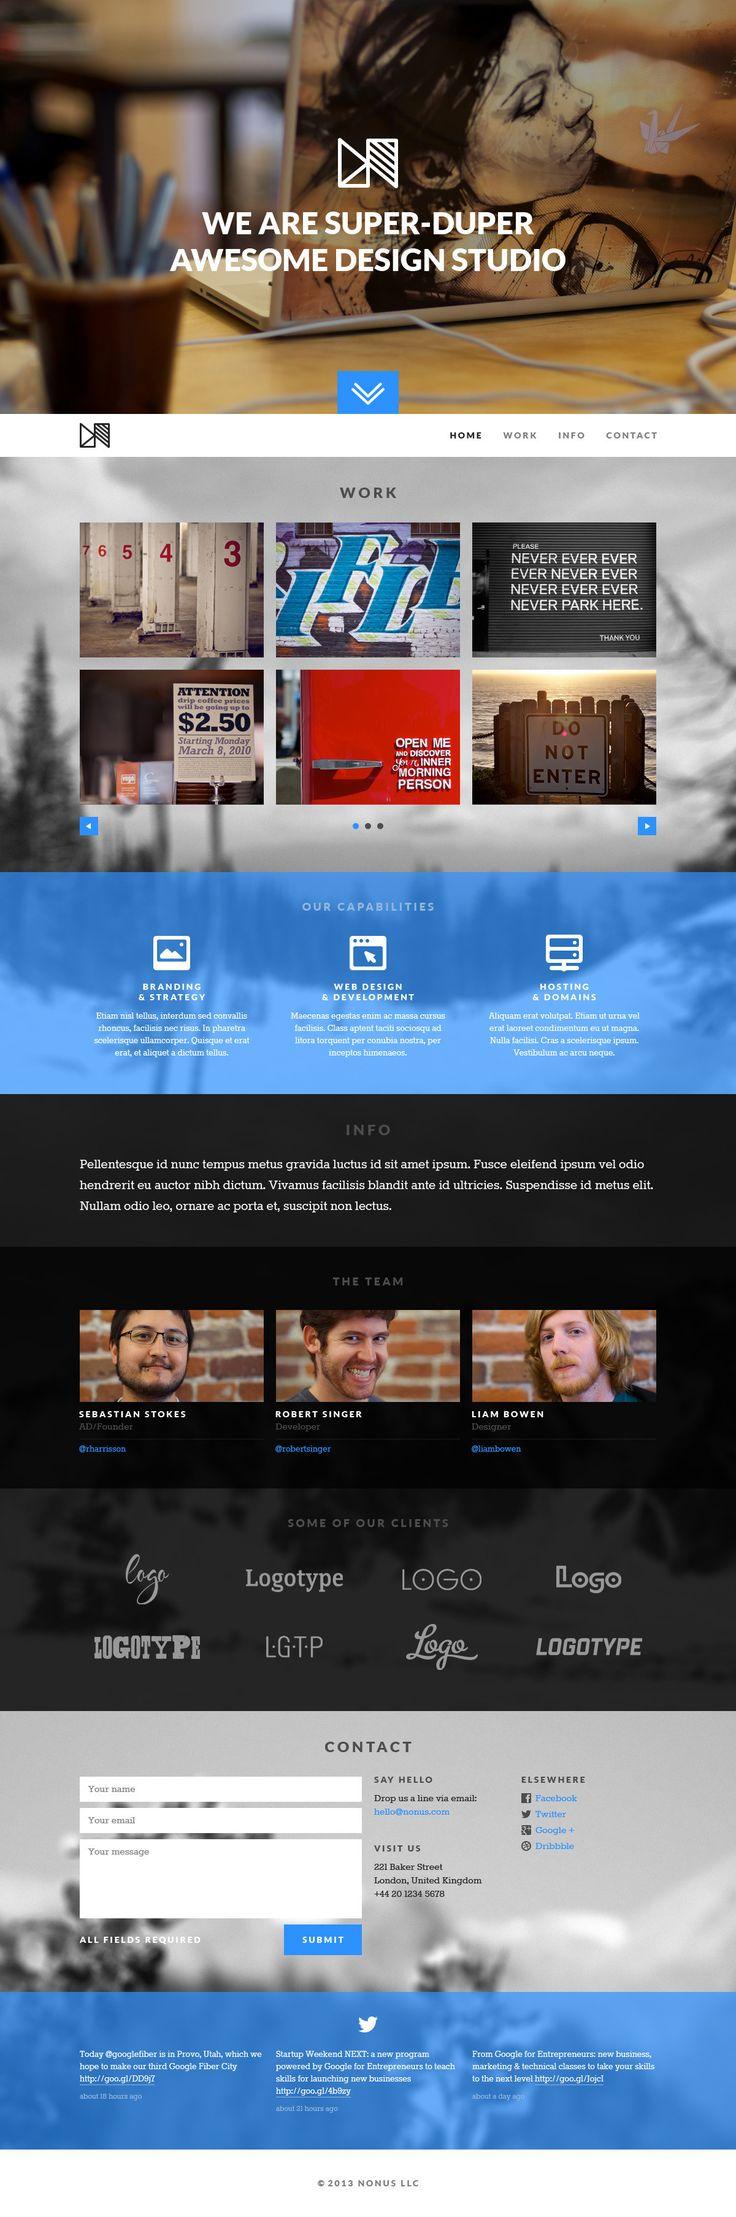 Nonus Parallax Wordpress Portfolio http://themeforest.net/item/nonus-parallax-wordpress-portfolio/5770359?ref=wpaw #web #design #wordpress